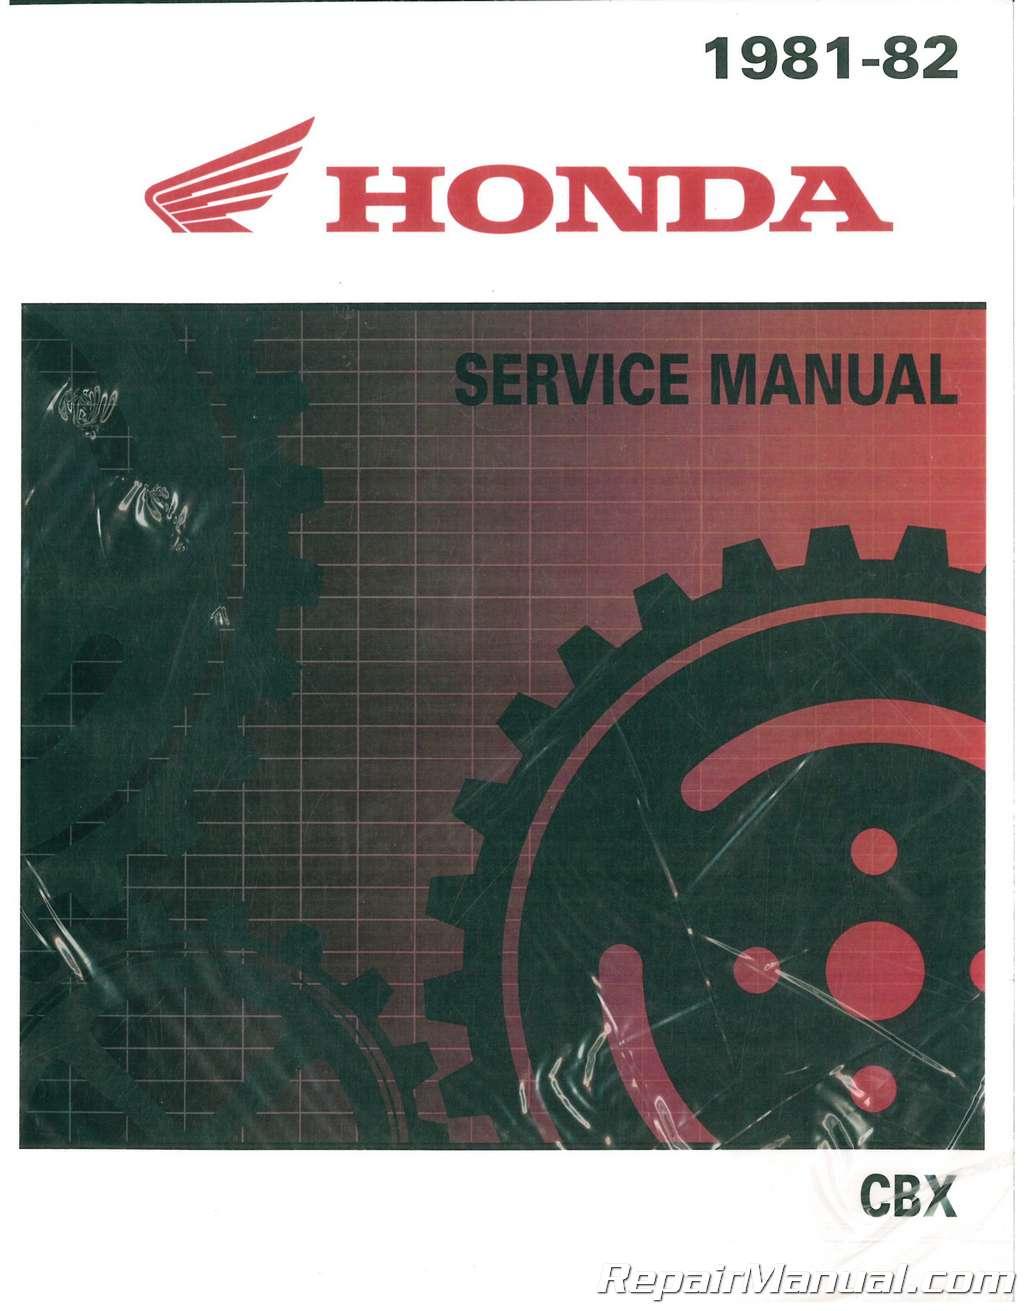 01 400ex Wiring Harness Schematics Data Diagrams Engine Diagram Honda Rancher 350 400 Carburetor Odicis